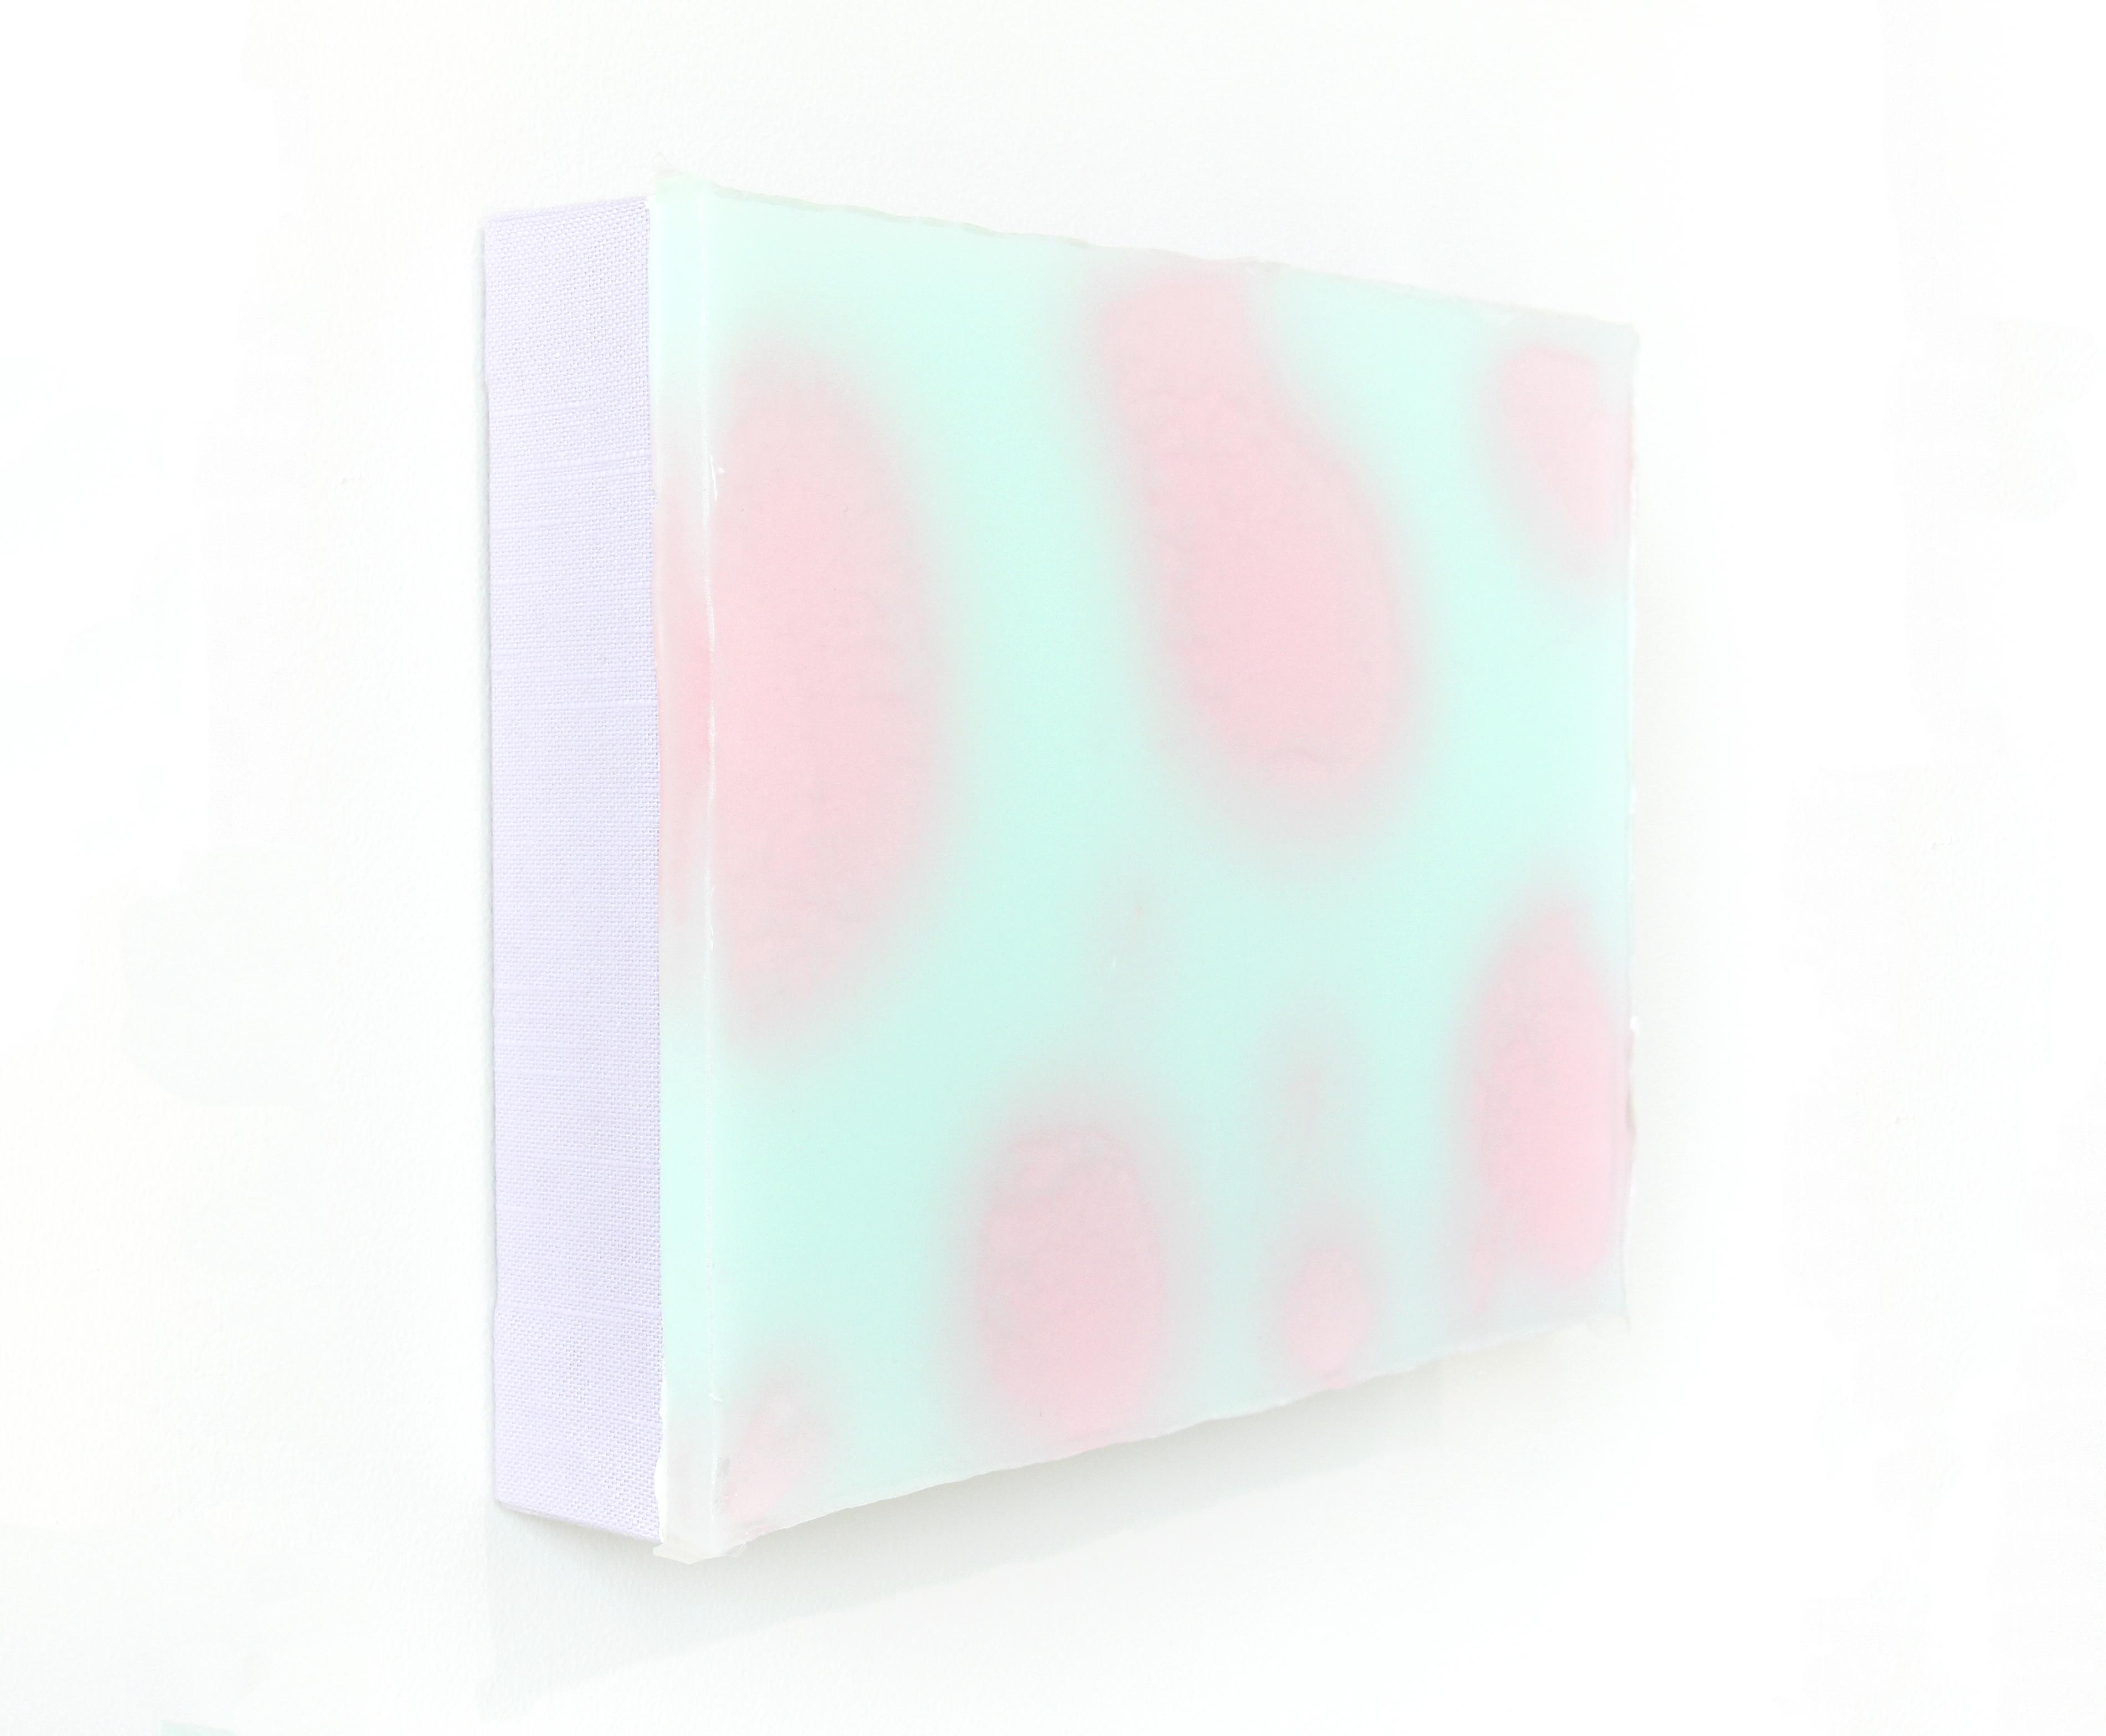 Ghost Blurs (pink, blue)